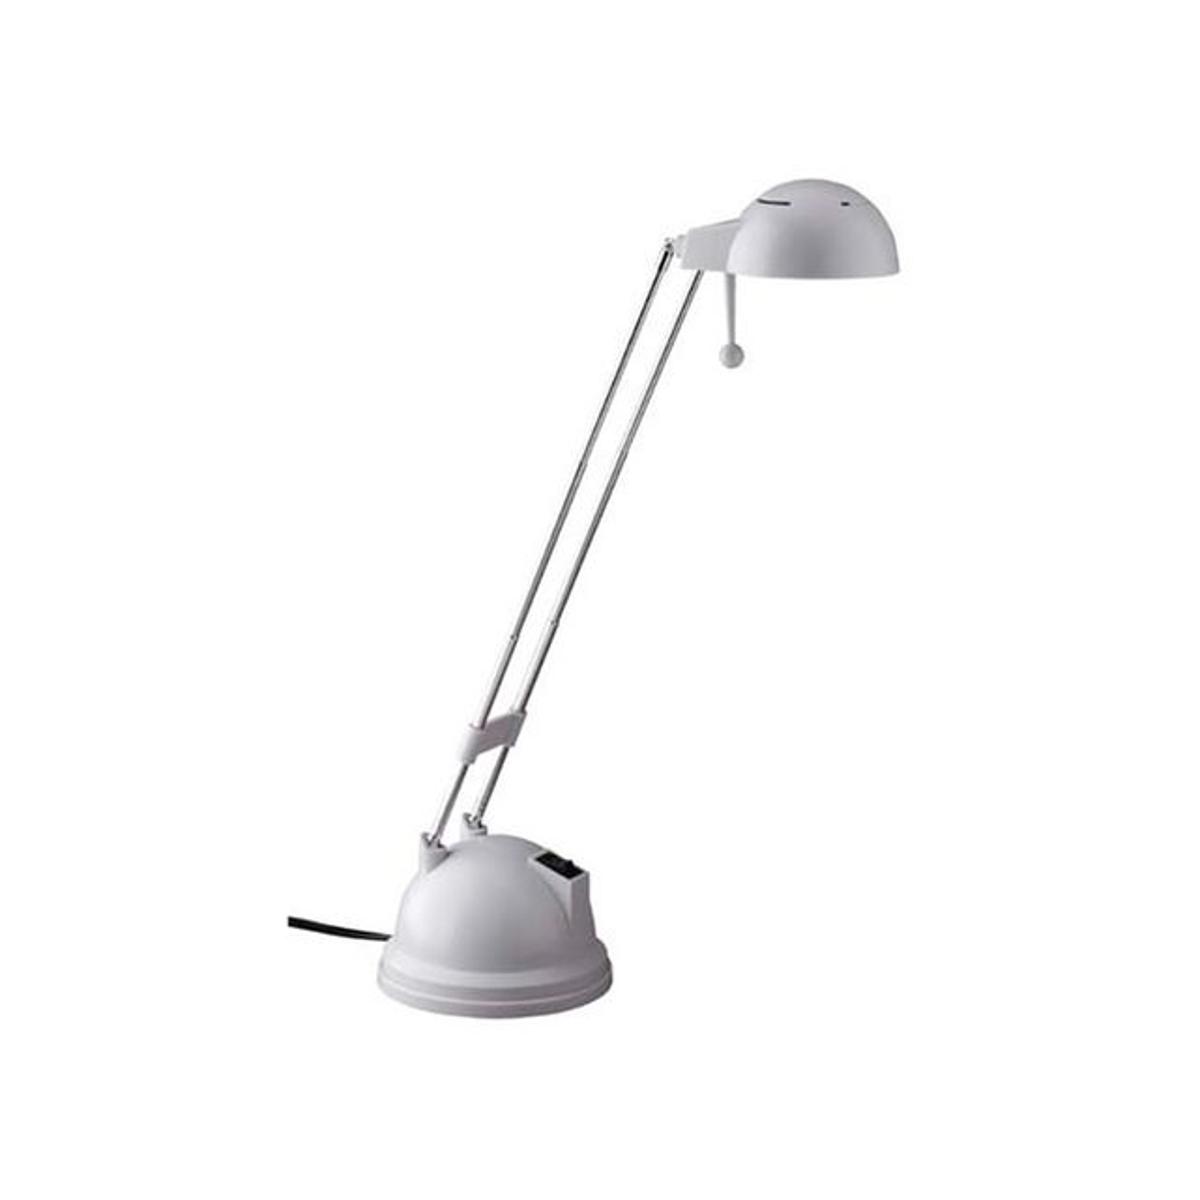 Lampe de bureau SALSA 1x20W G4 GRIS - BRILLIANT - G08048_22